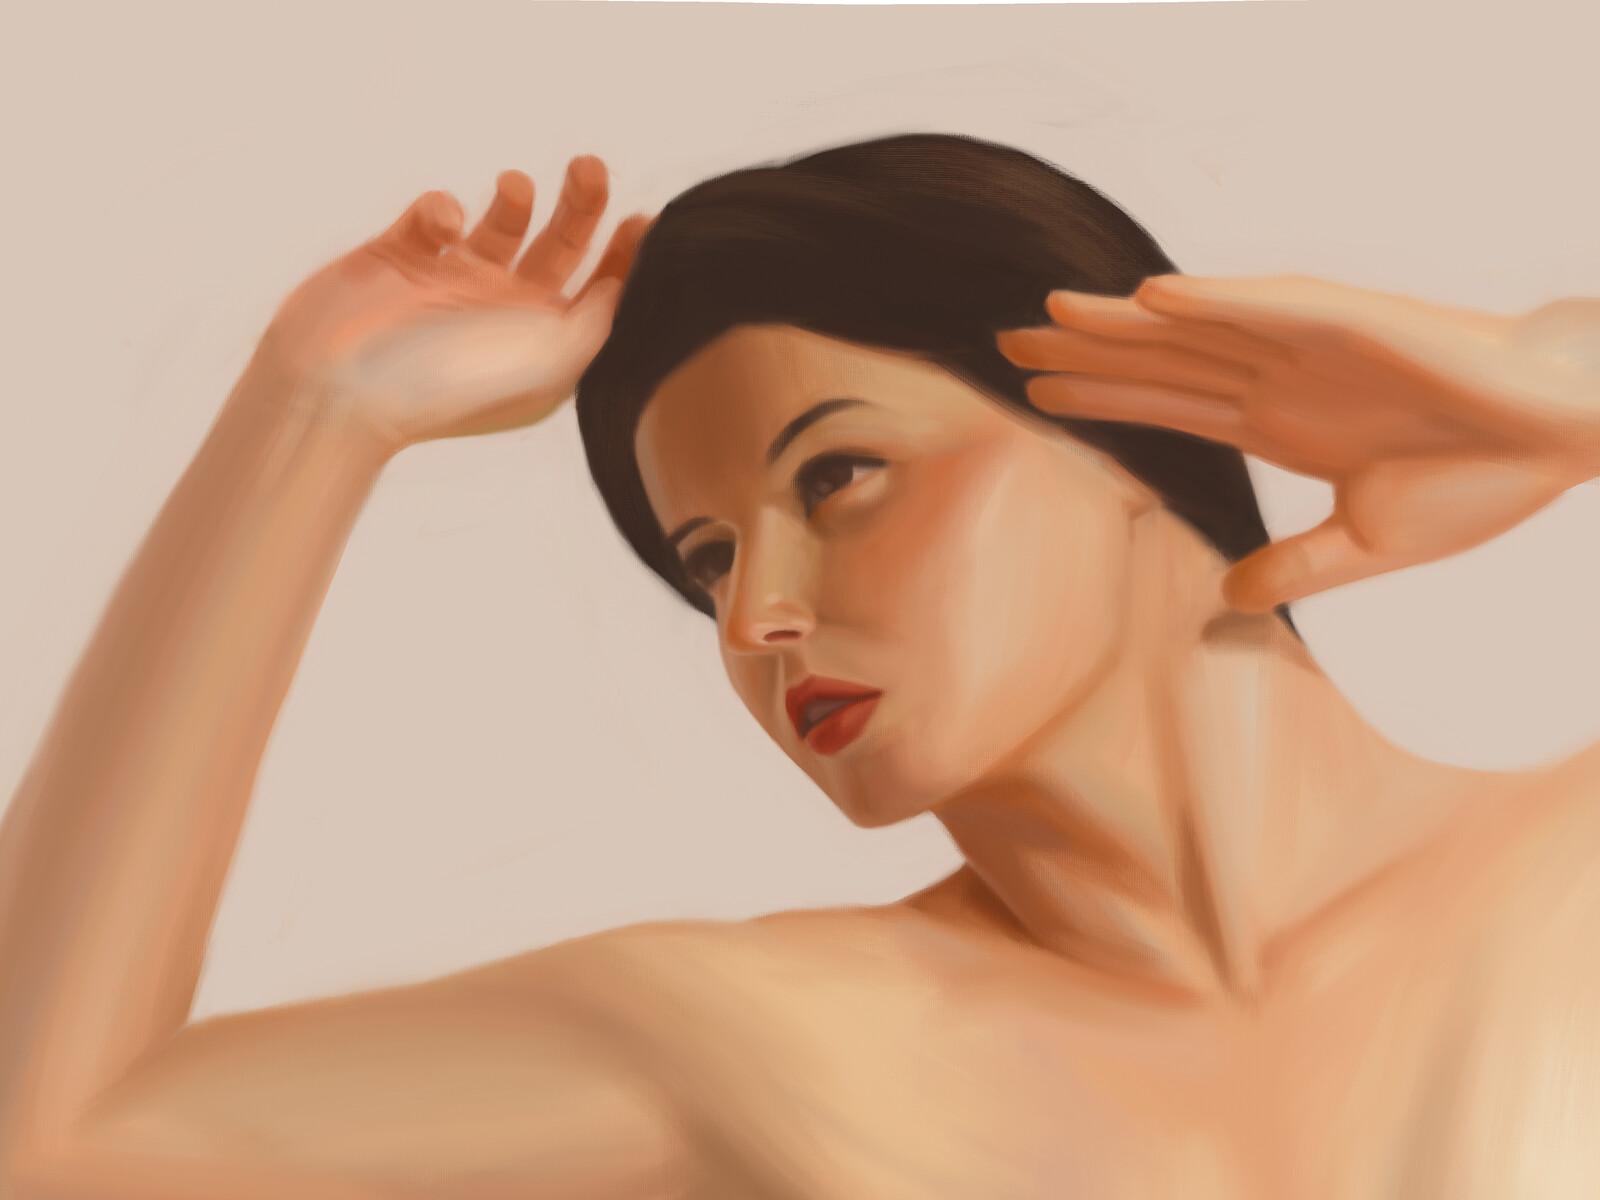 Portrait study - July 2020